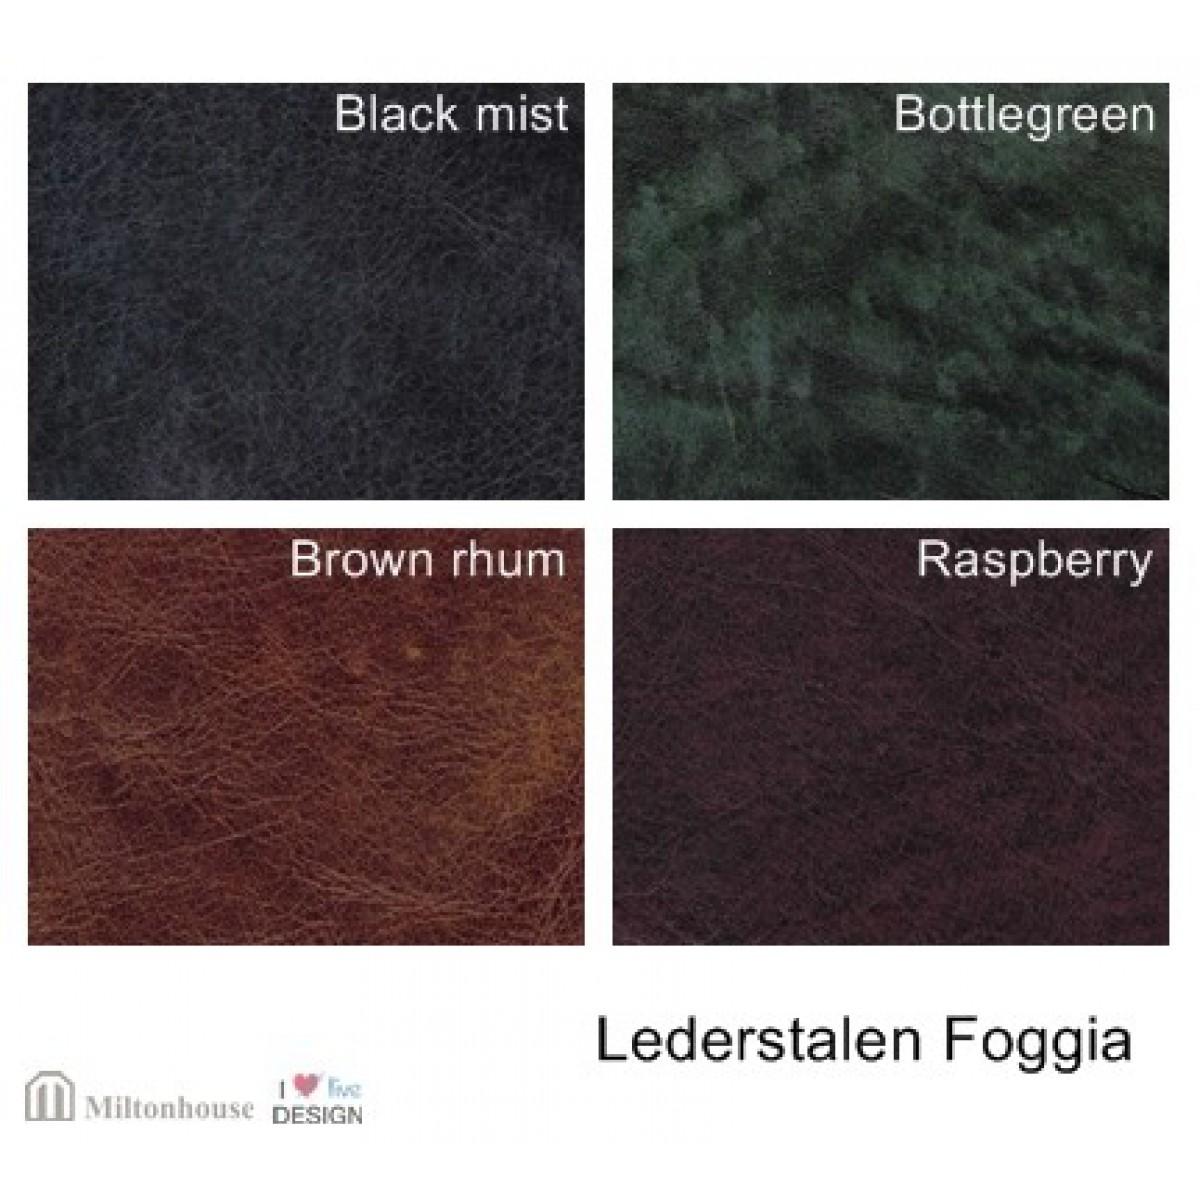 foggia-leder-leer-stalen-het-anker-l'ancora